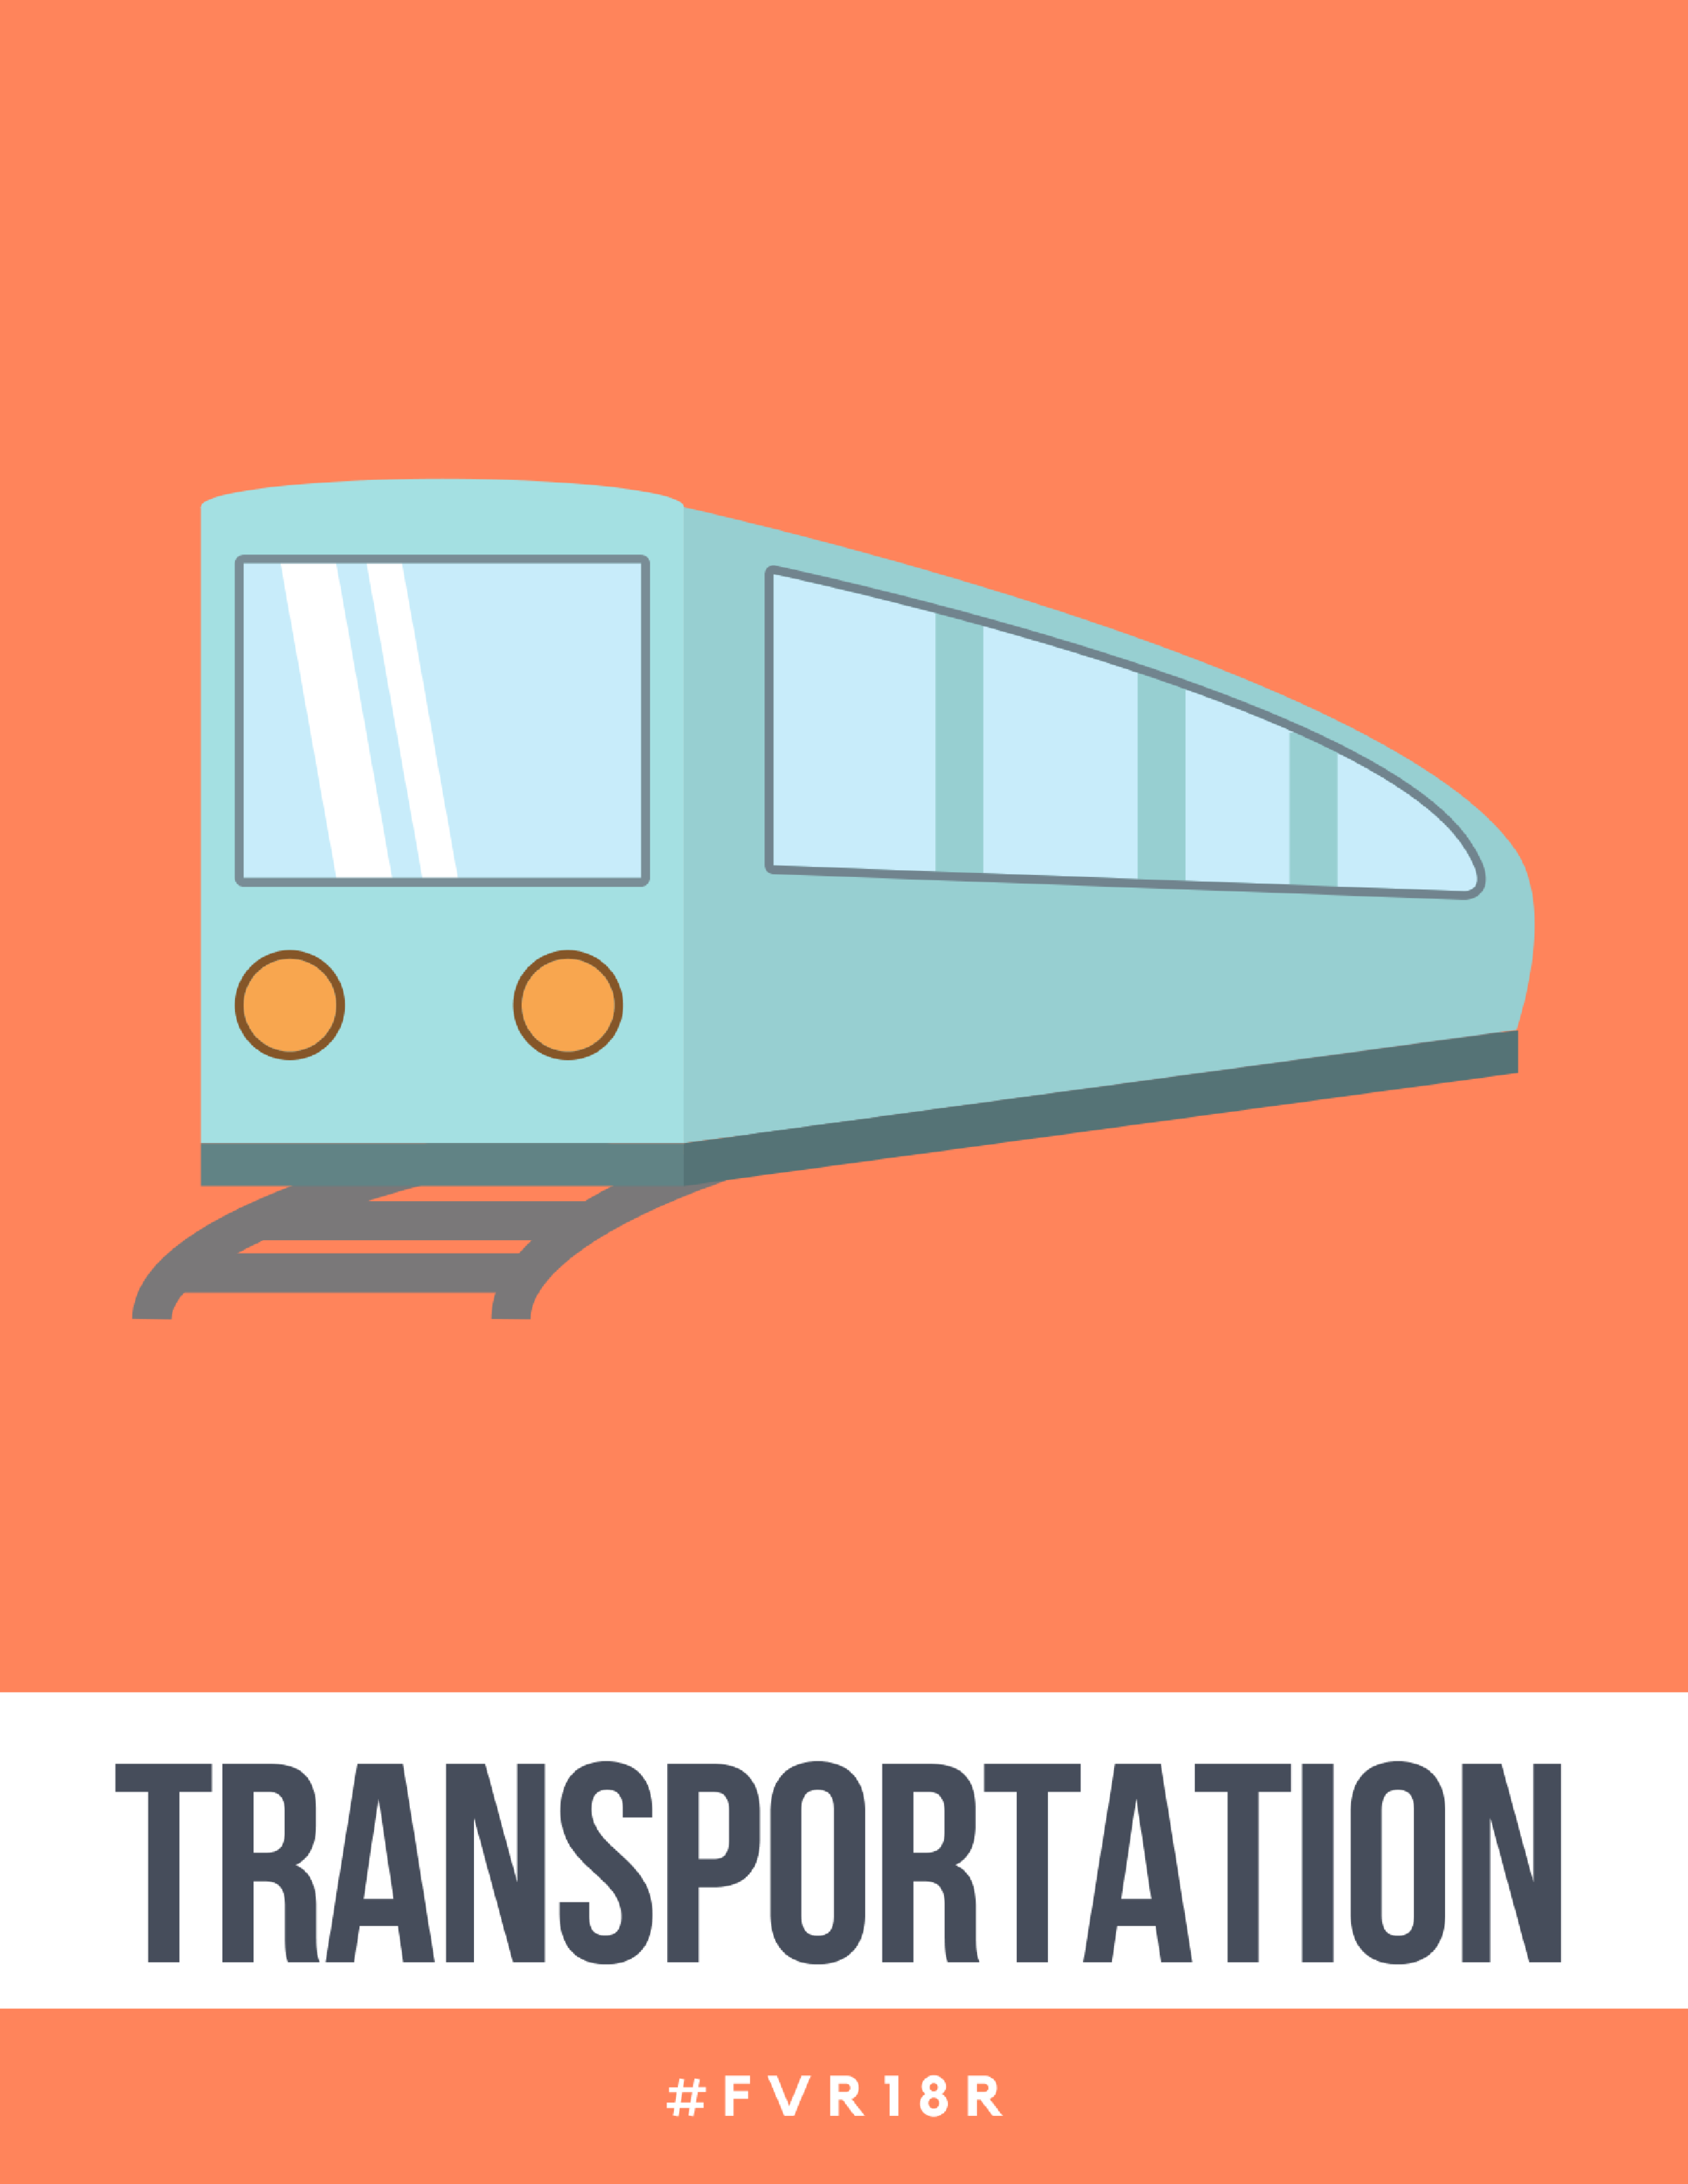 K-2 Library Signage, Transportation